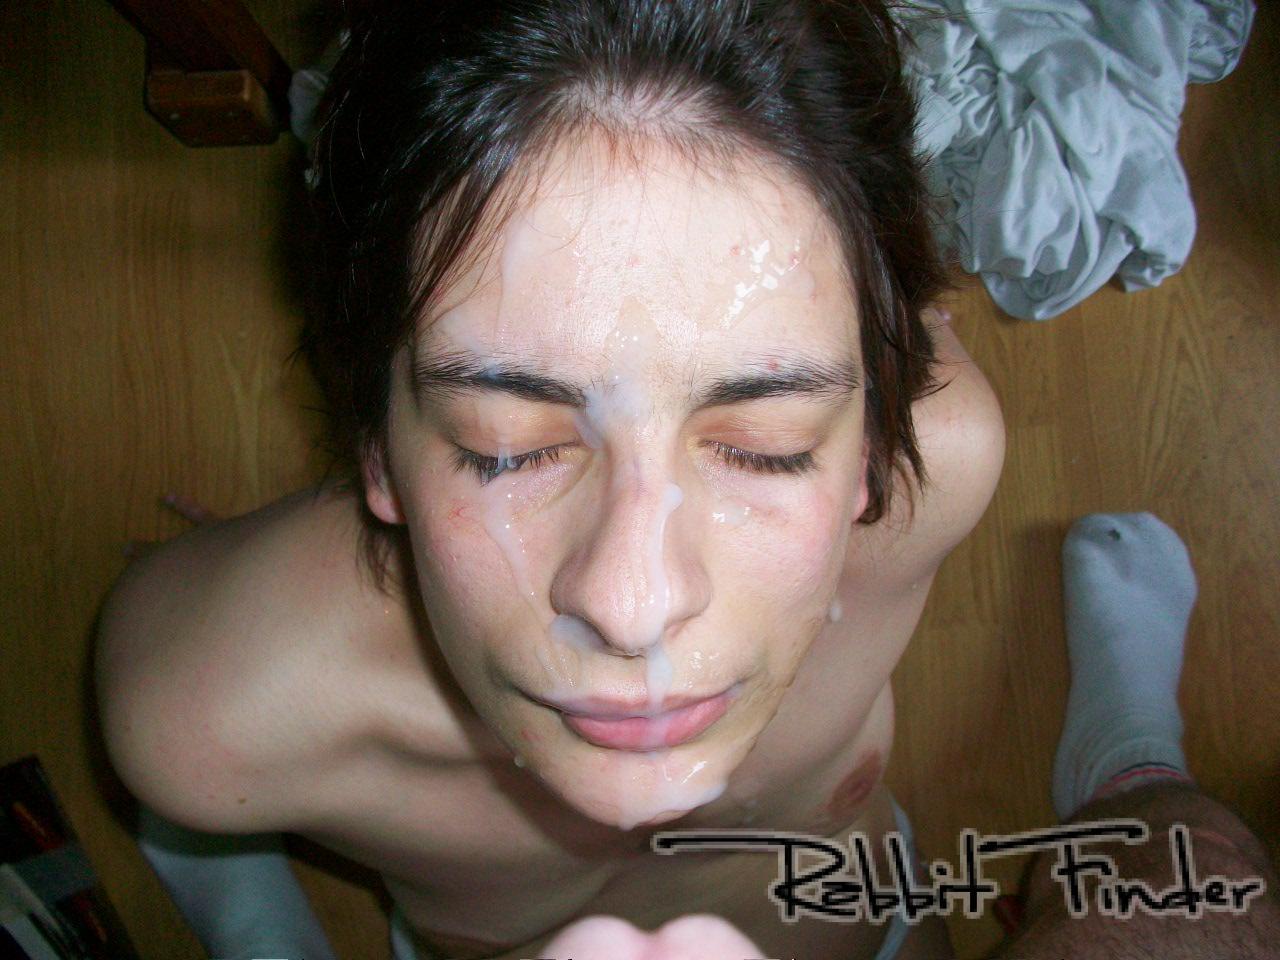 Her name jail penetrate ass prostate orgasm deep bastard